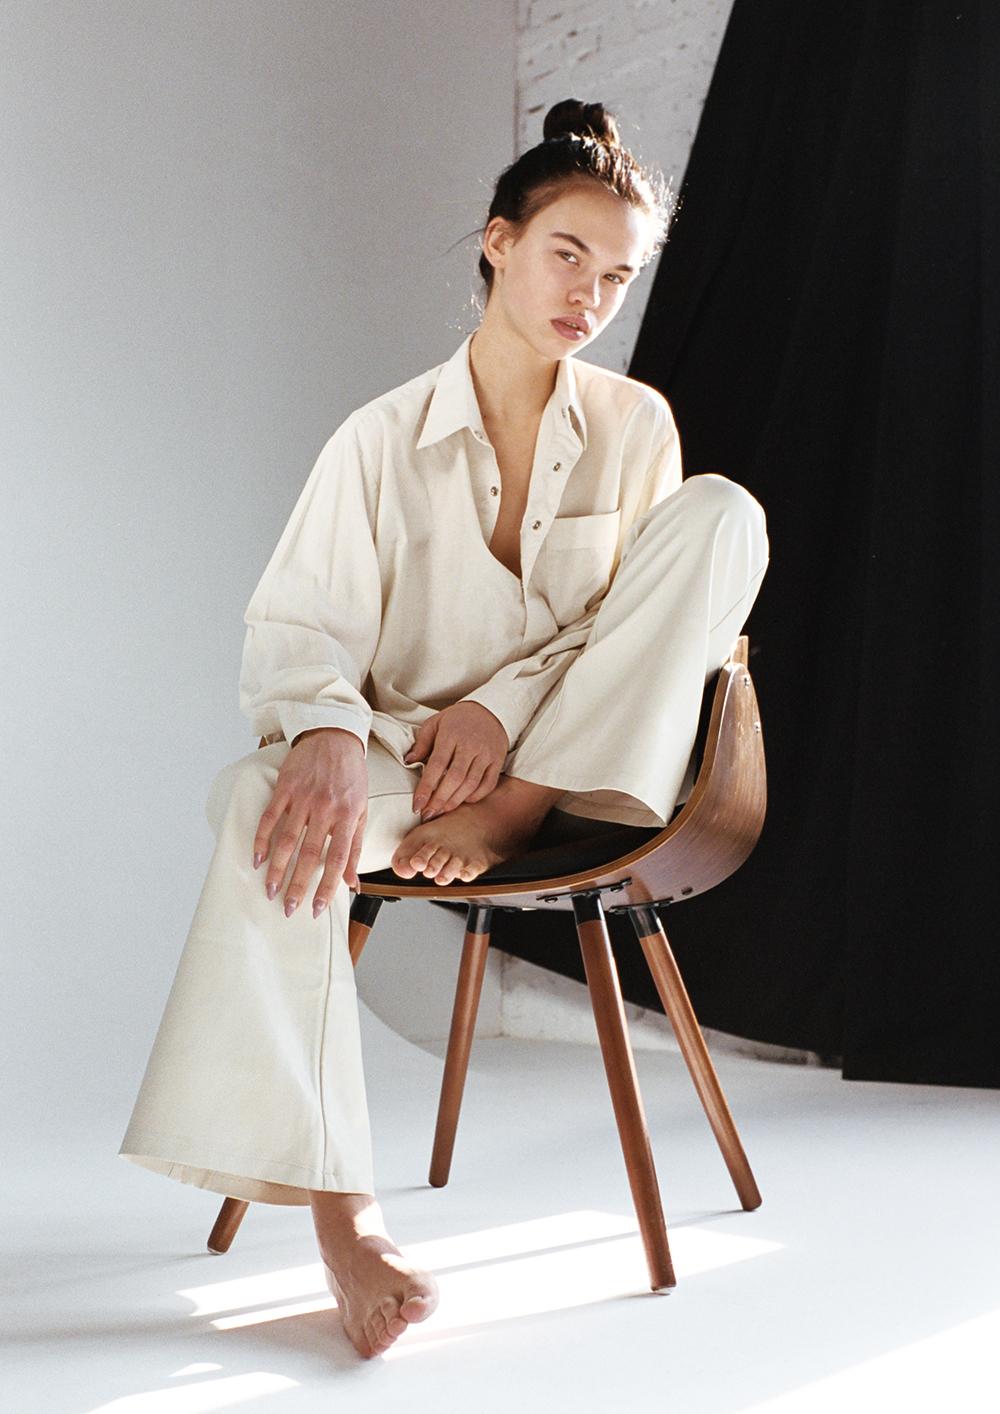 Model Marina Maru Fresh Talent Management